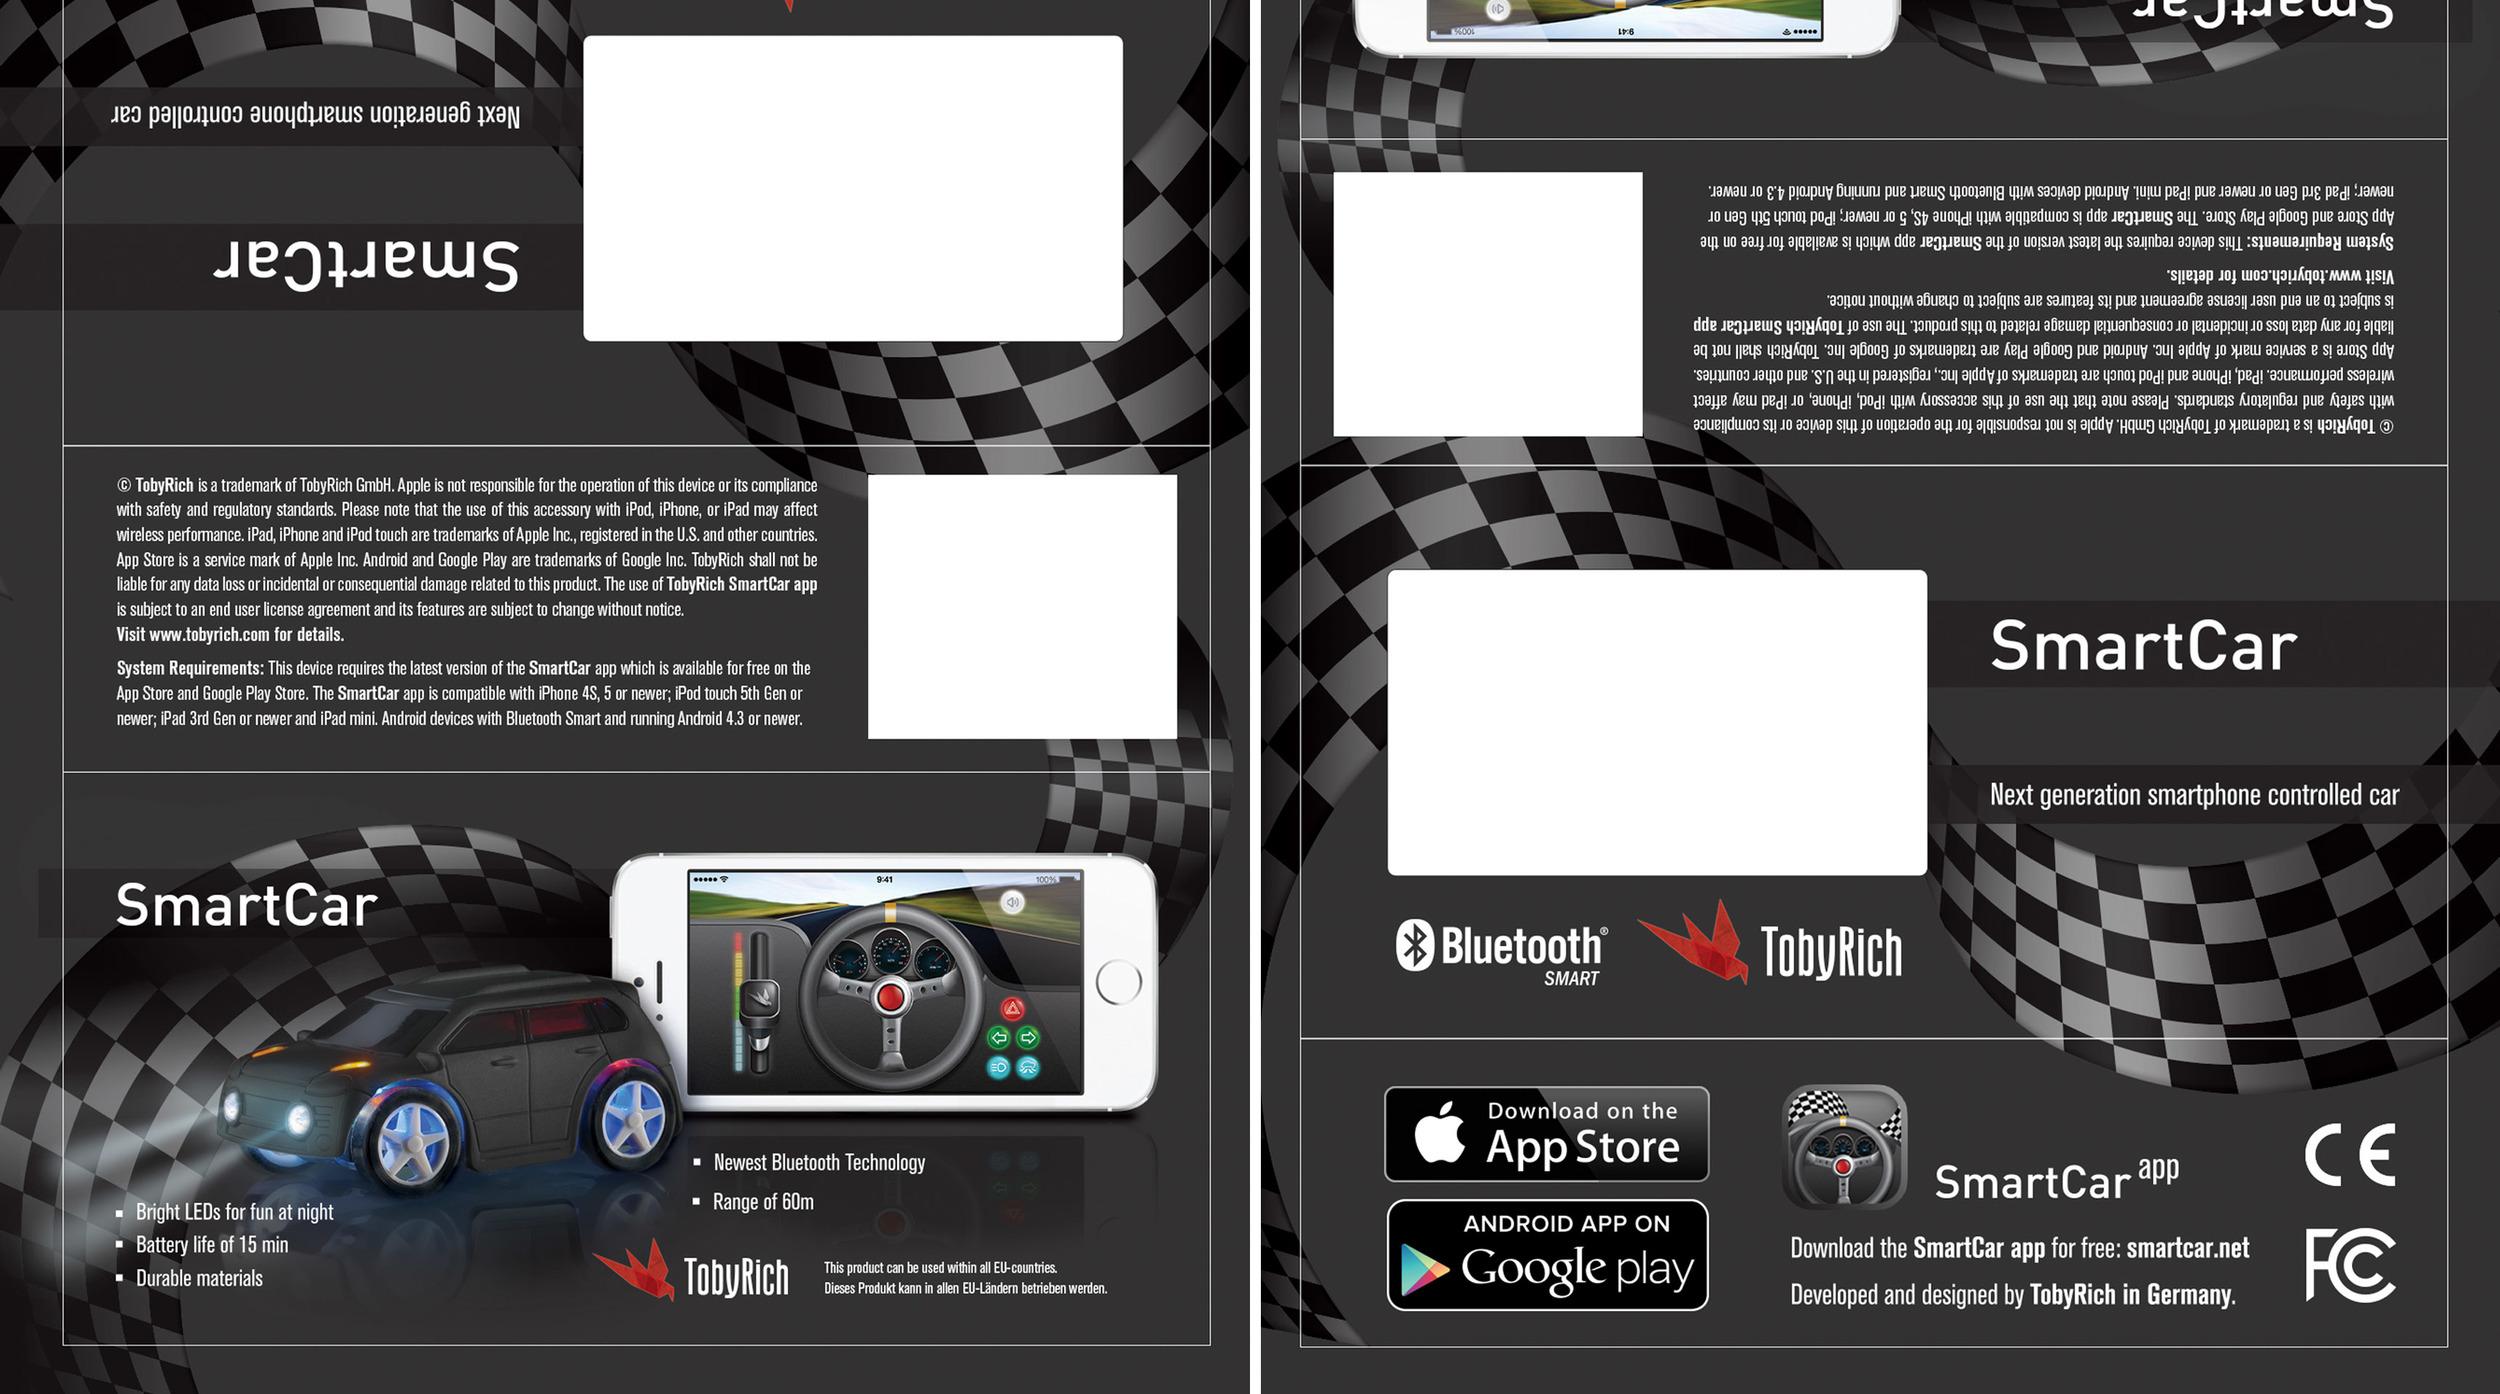 design for SmartCar final art